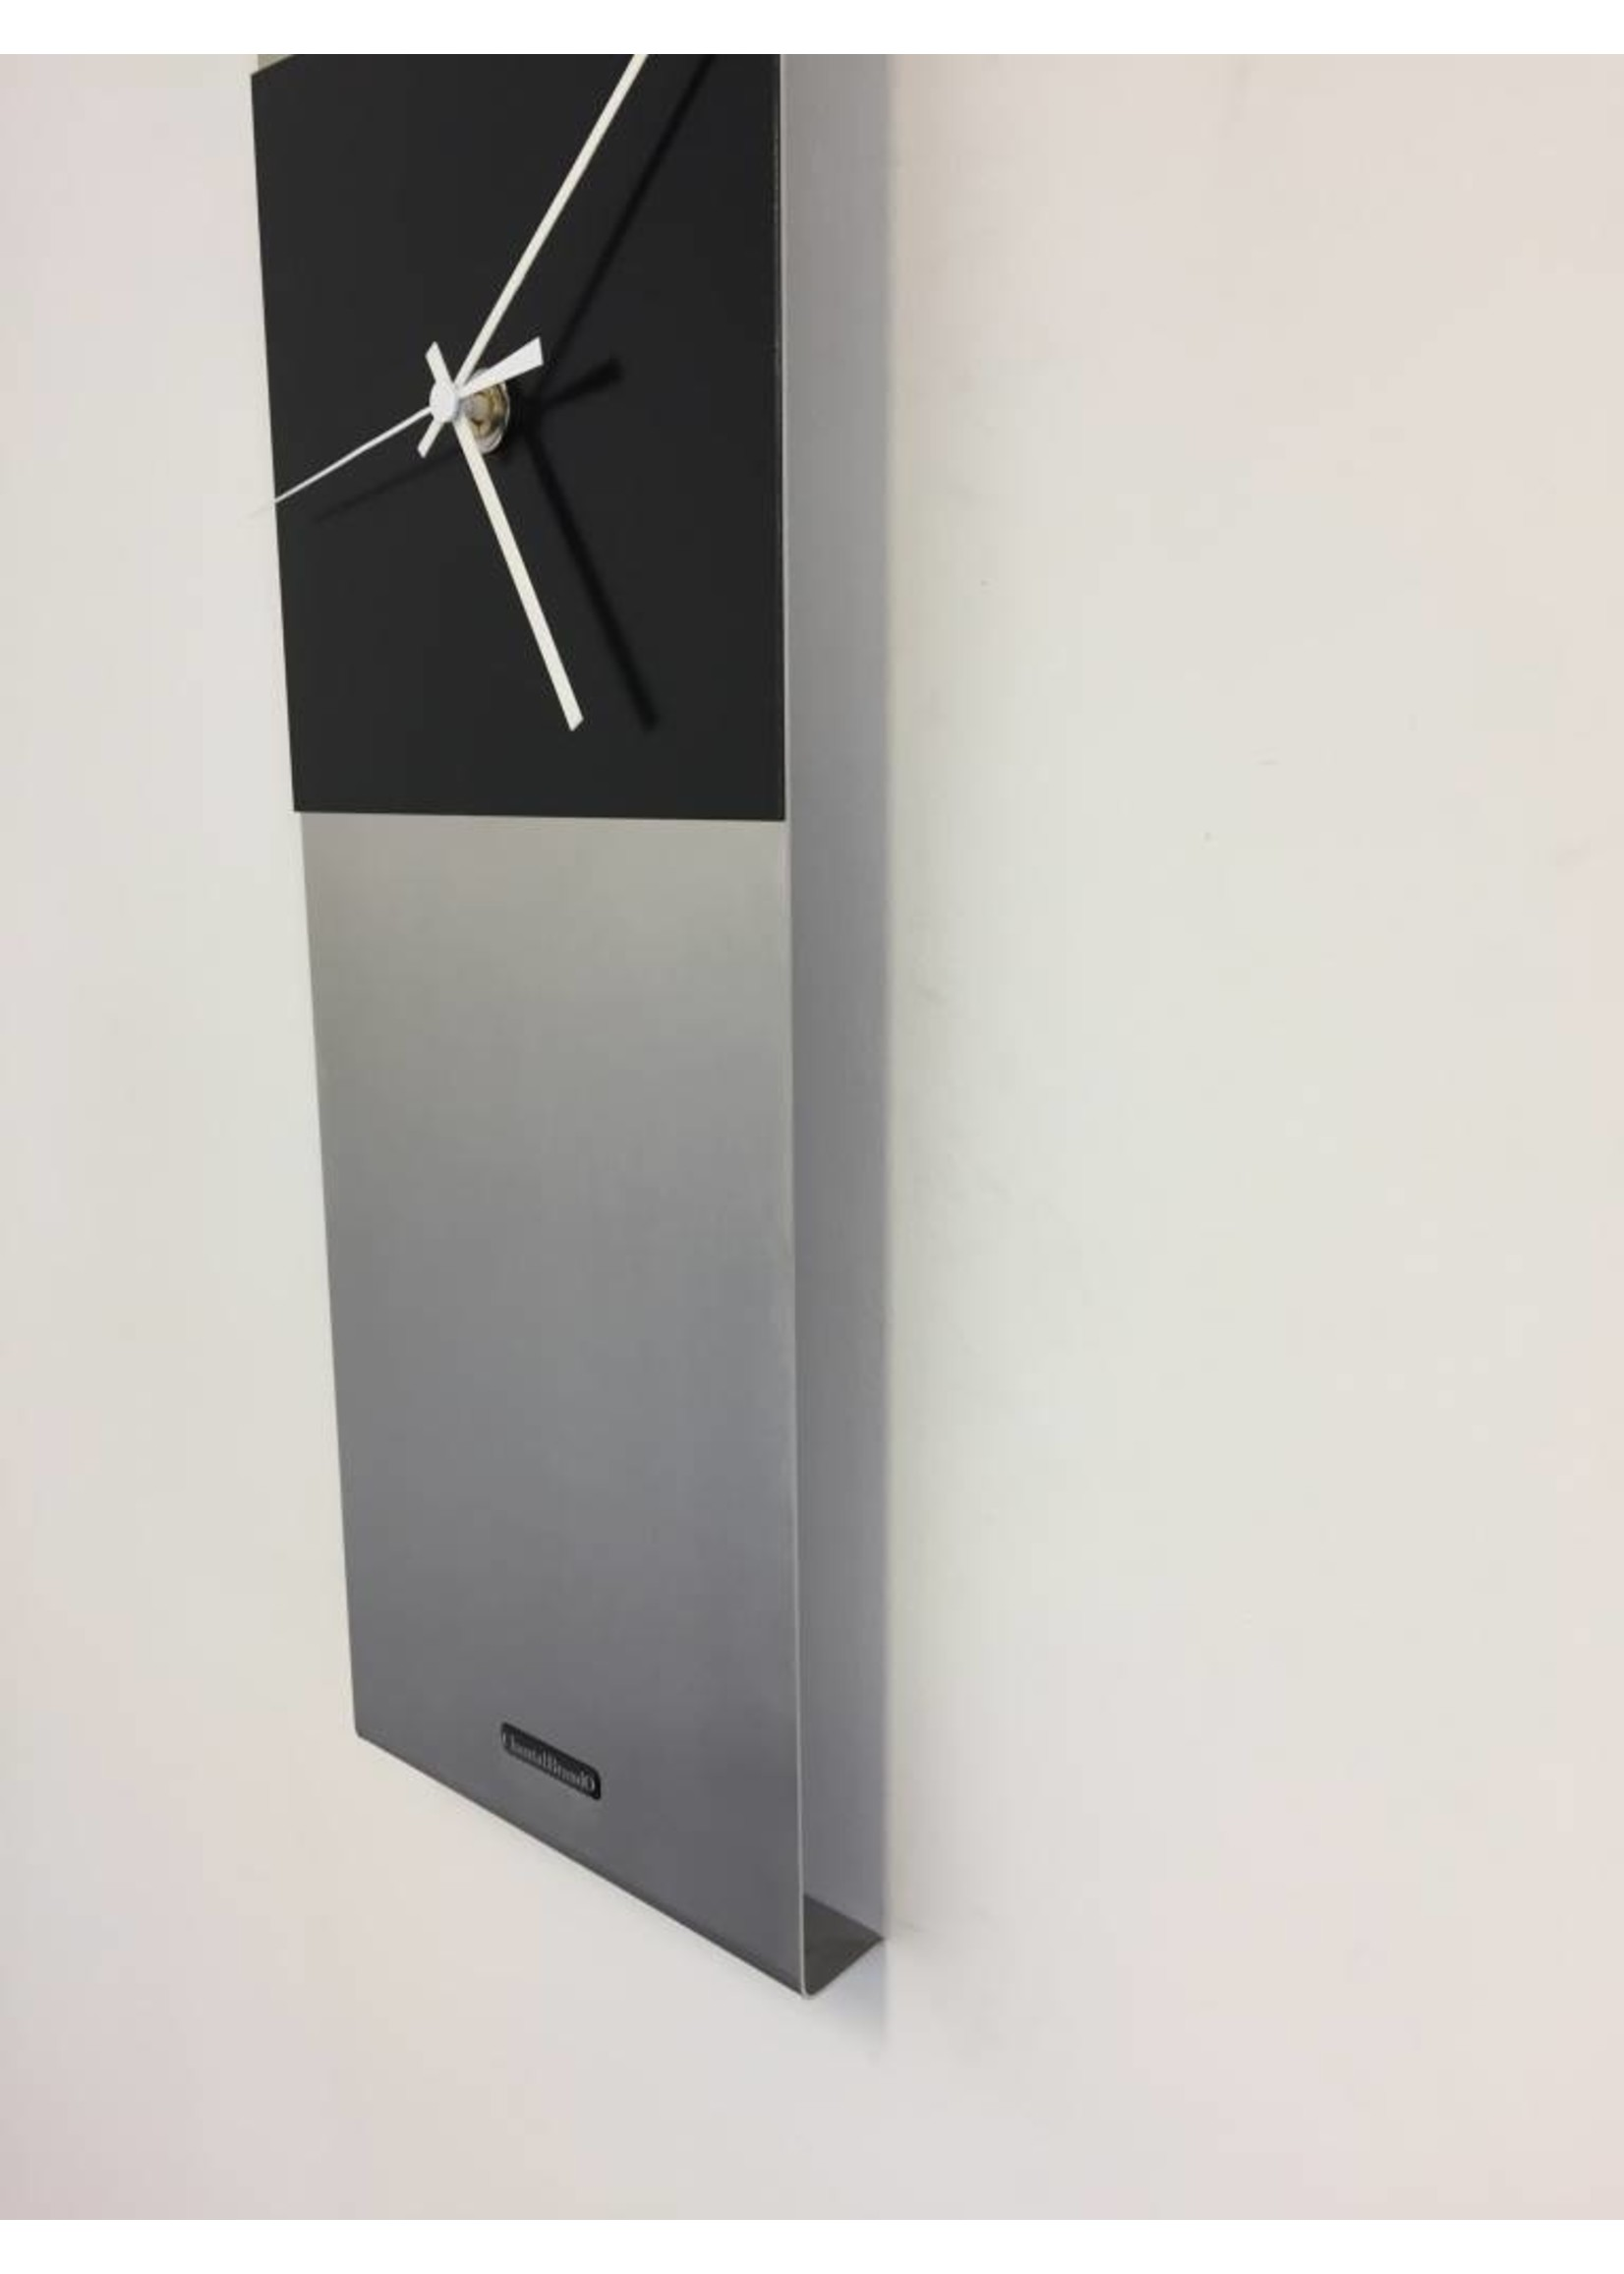 Klokkendiscounter Wandklok Cassiopee Black Square XL